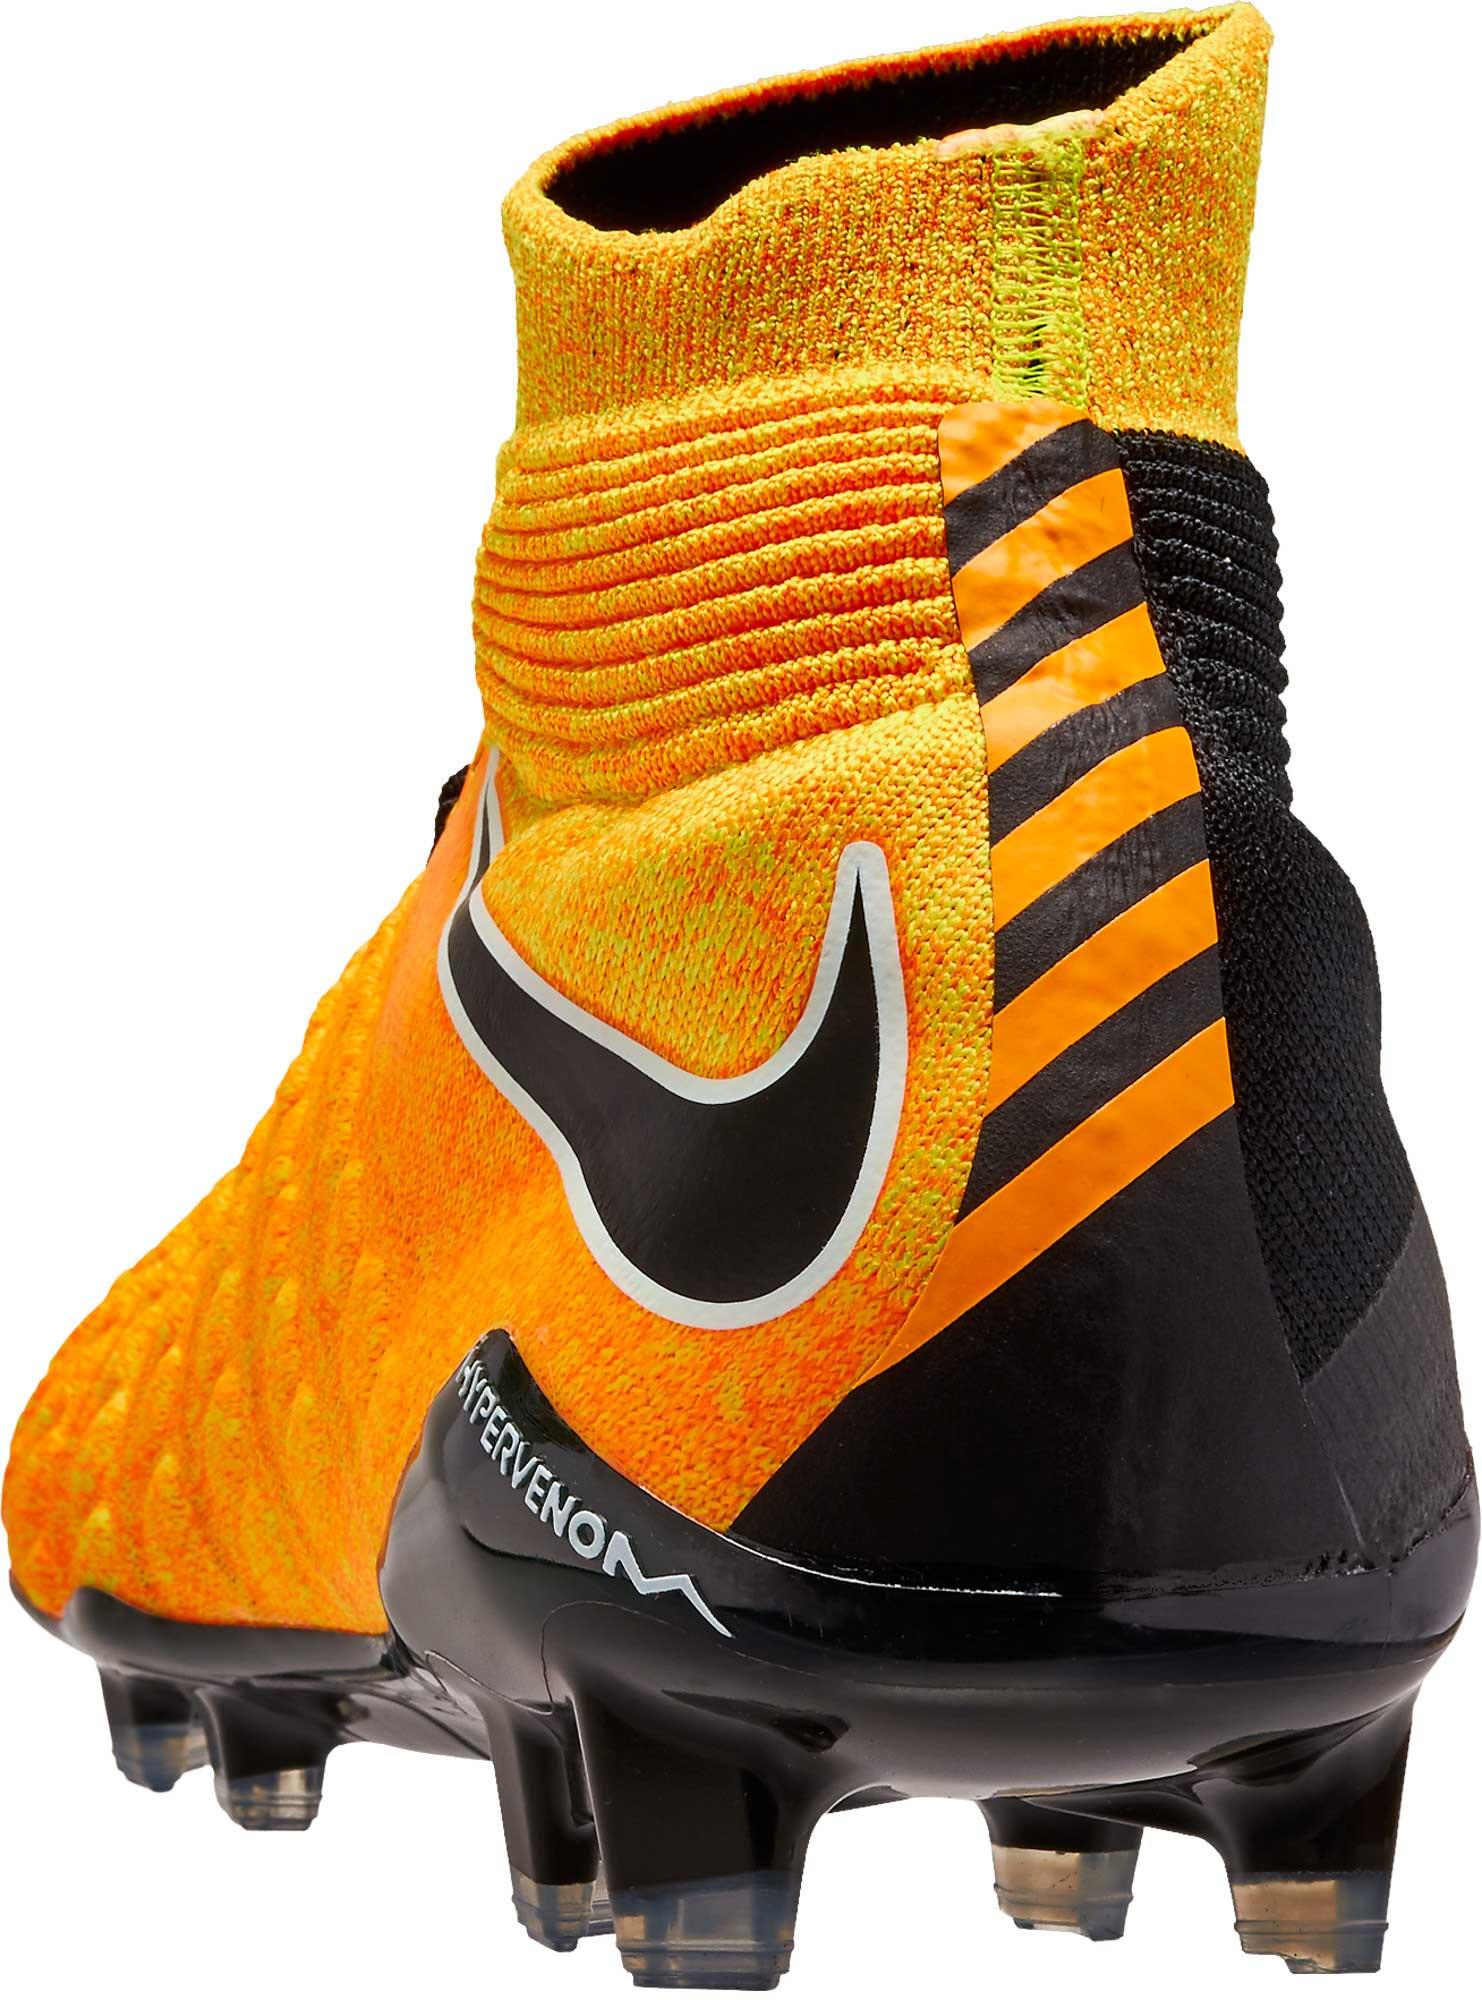 huge selection of a9416 568df Nike Hypervenom Phantom III DF - Phantom Soccer Cleats